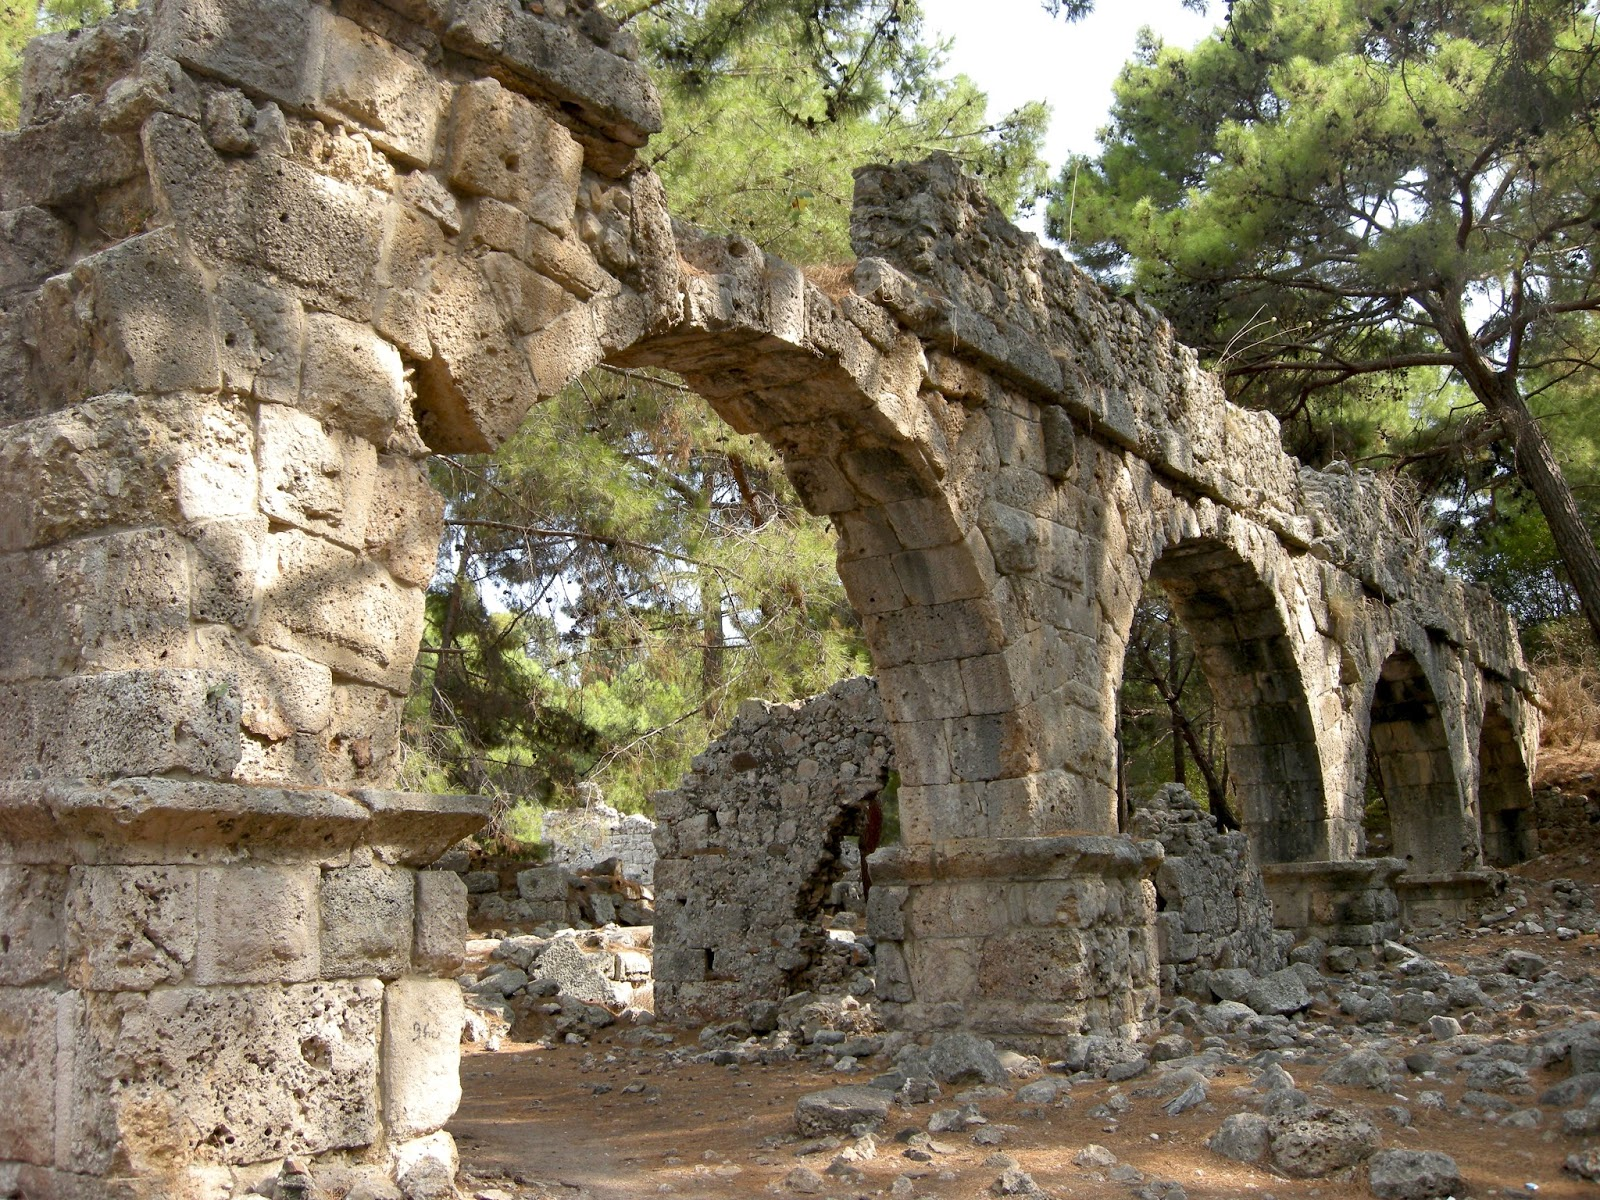 Phaselis Antik Kenti Gezi Rehberi